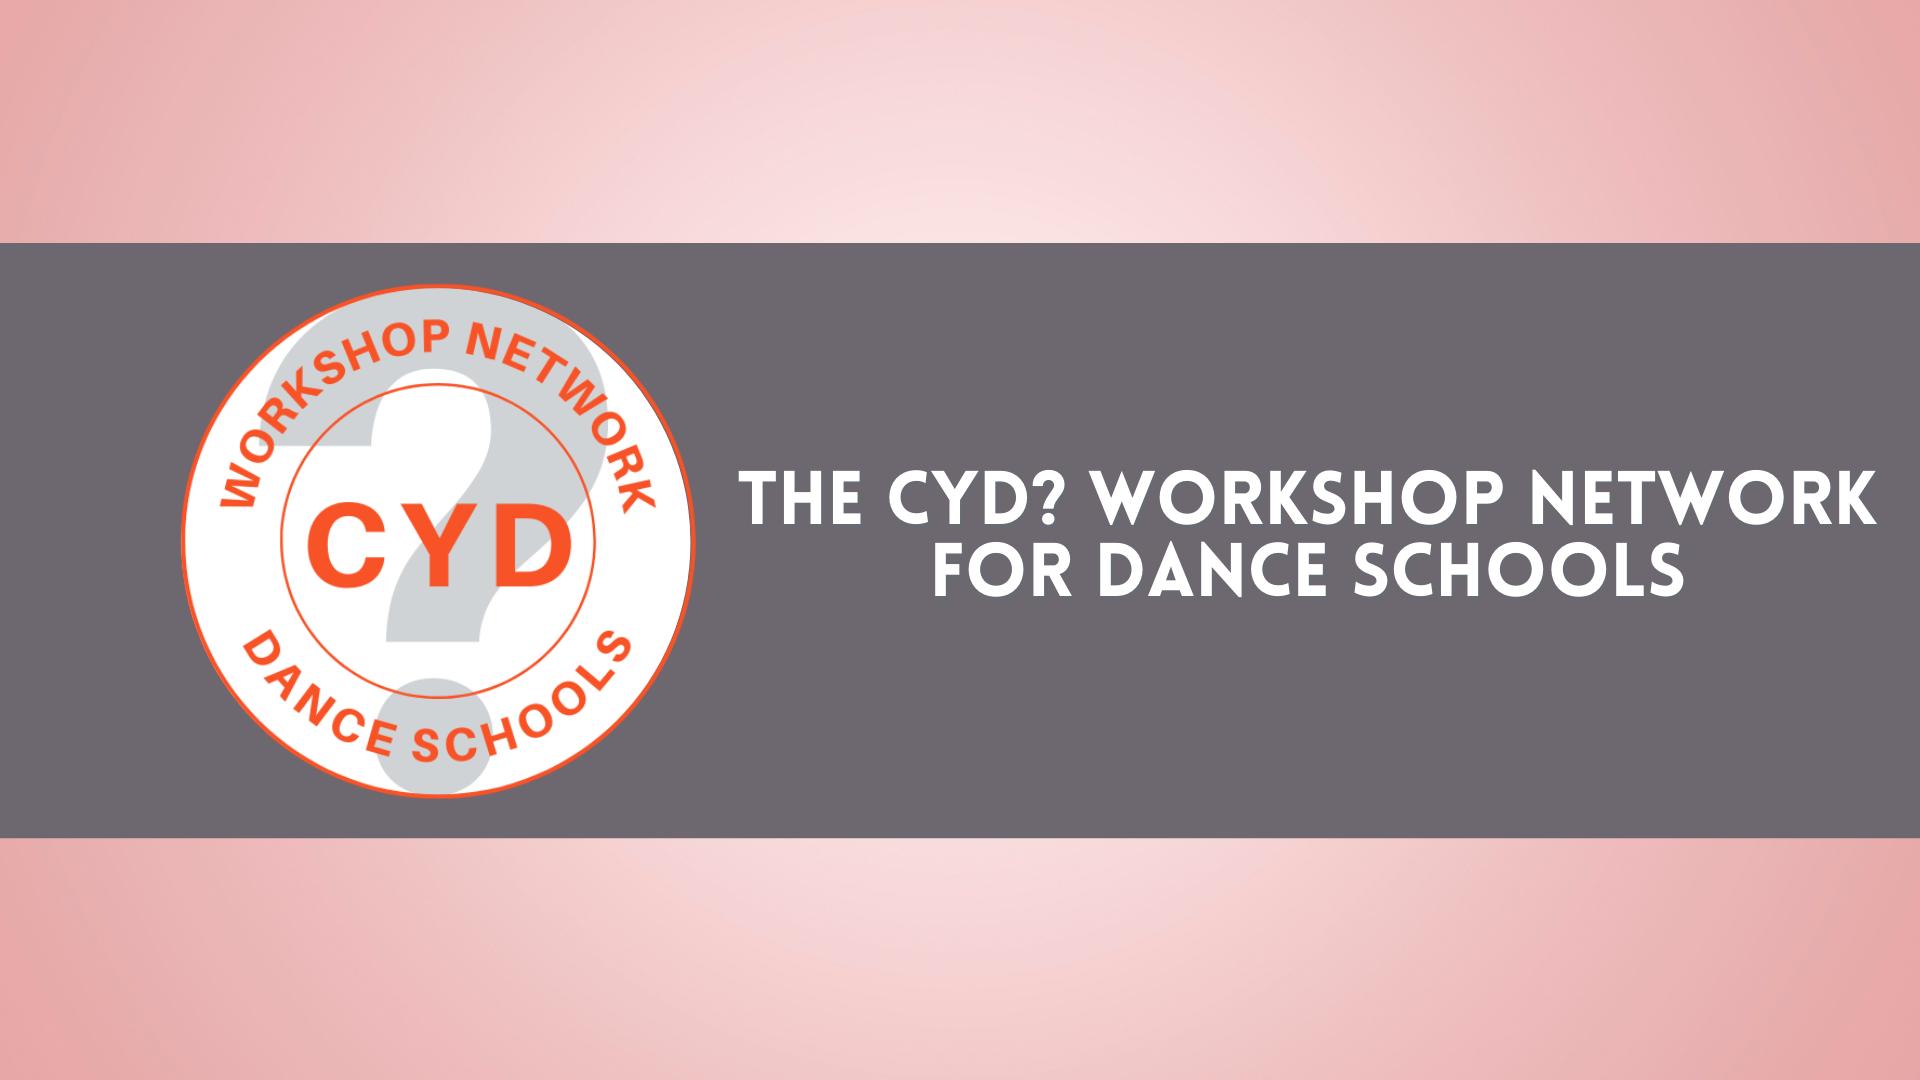 Workshop Network